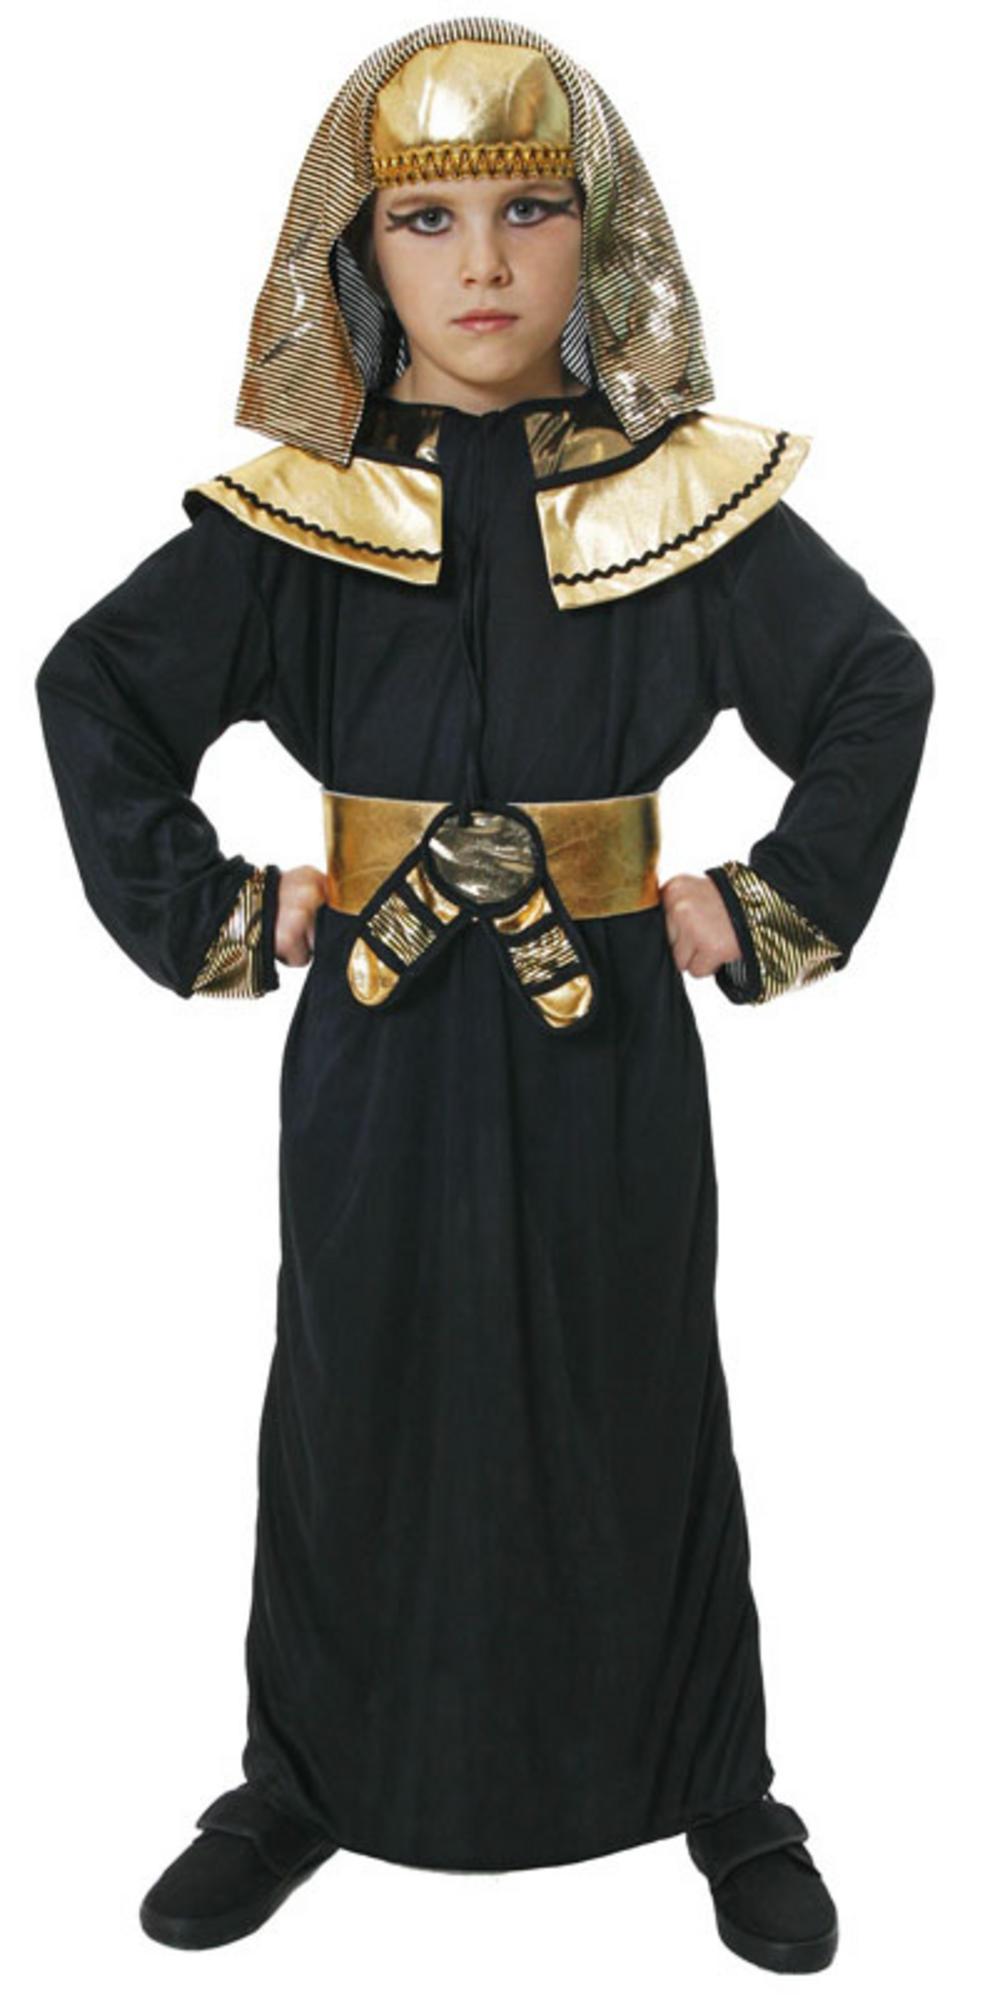 Boysu0027 Egyptian Pharaoh  sc 1 st  Mega Fancy Dress & Boysu0027 Egyptian Pharaoh | TV Book and Film Costumes | Mega Fancy Dress